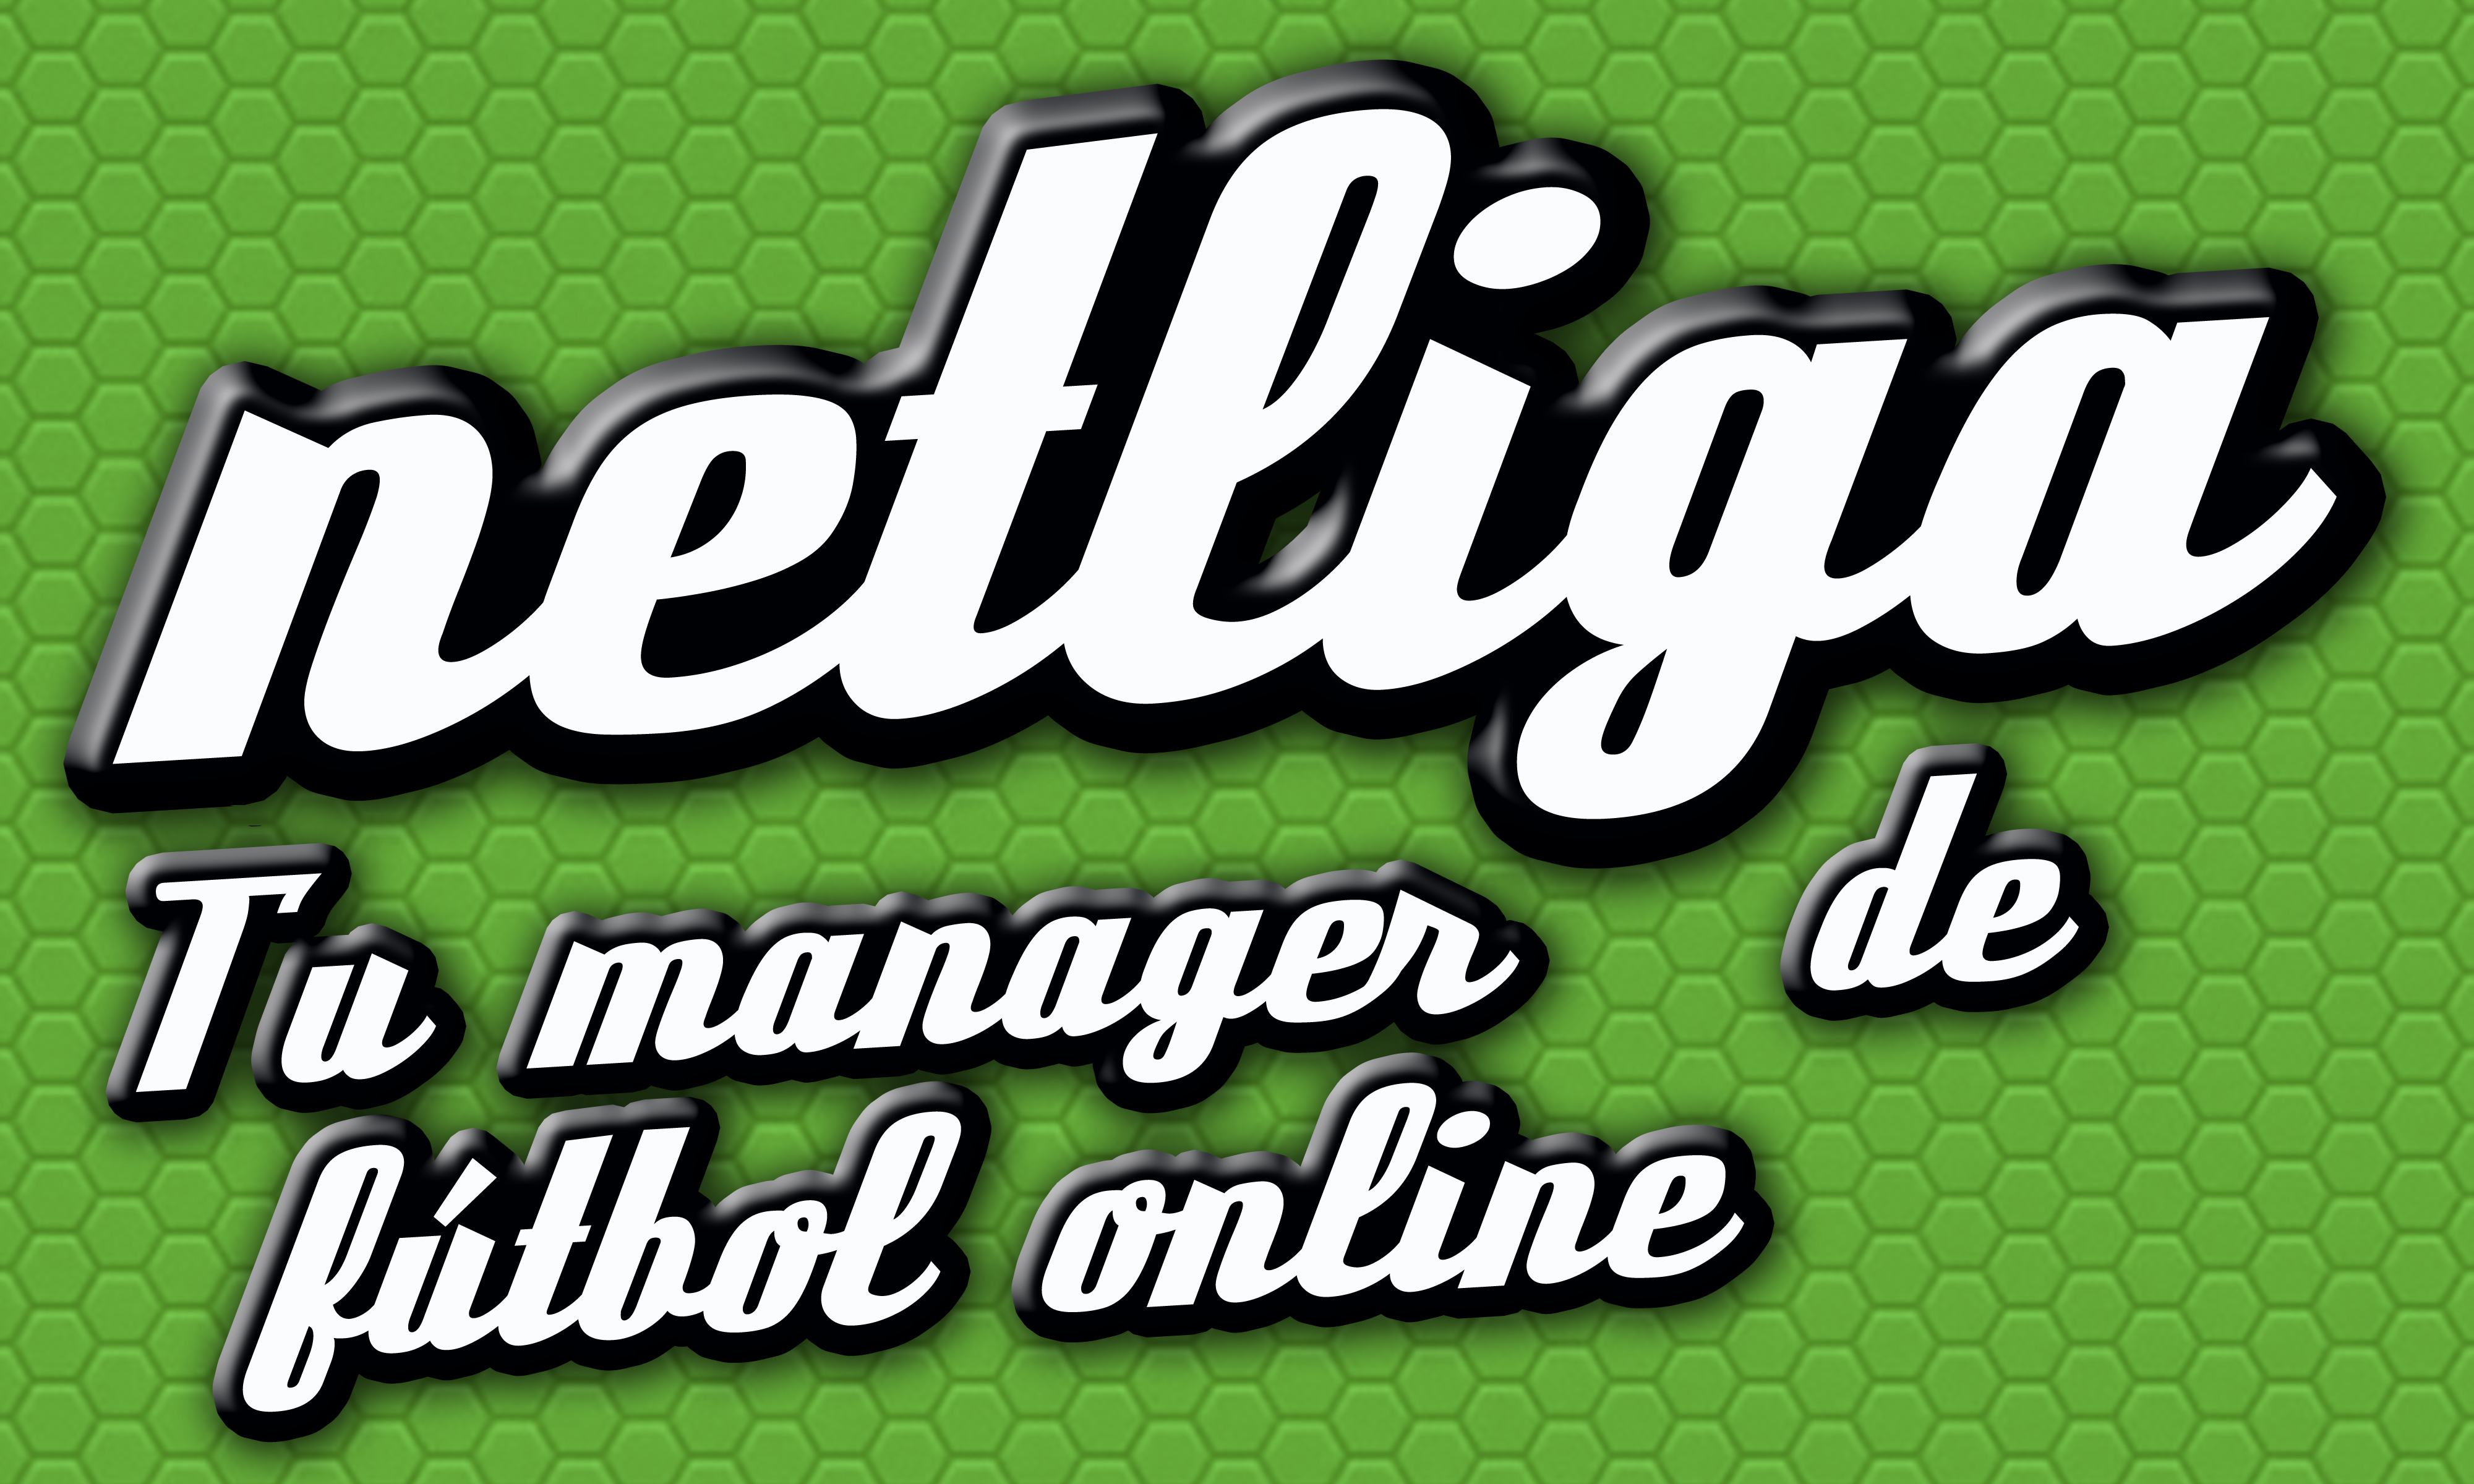 Las gangas de NetLiga.com